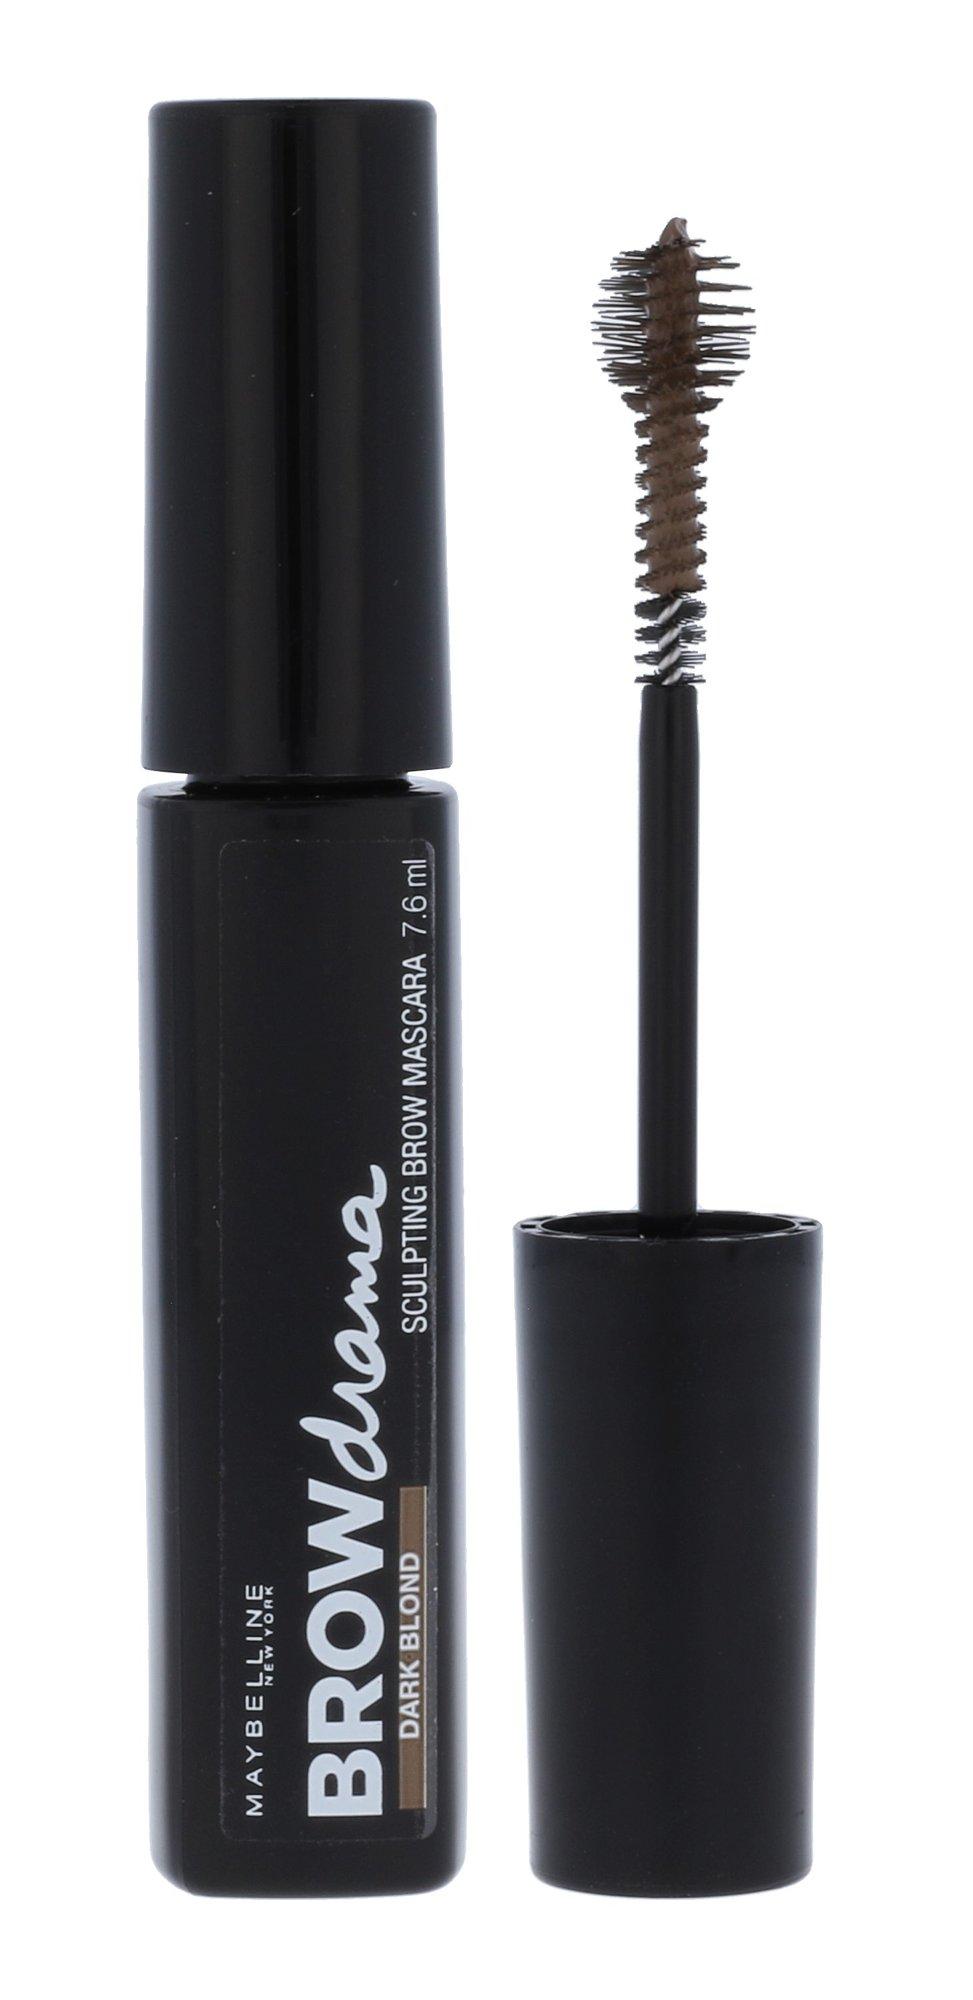 Maybelline Brow Drama Sculpting Brow Mascara Cosmetic 7,6ml Dark Blond